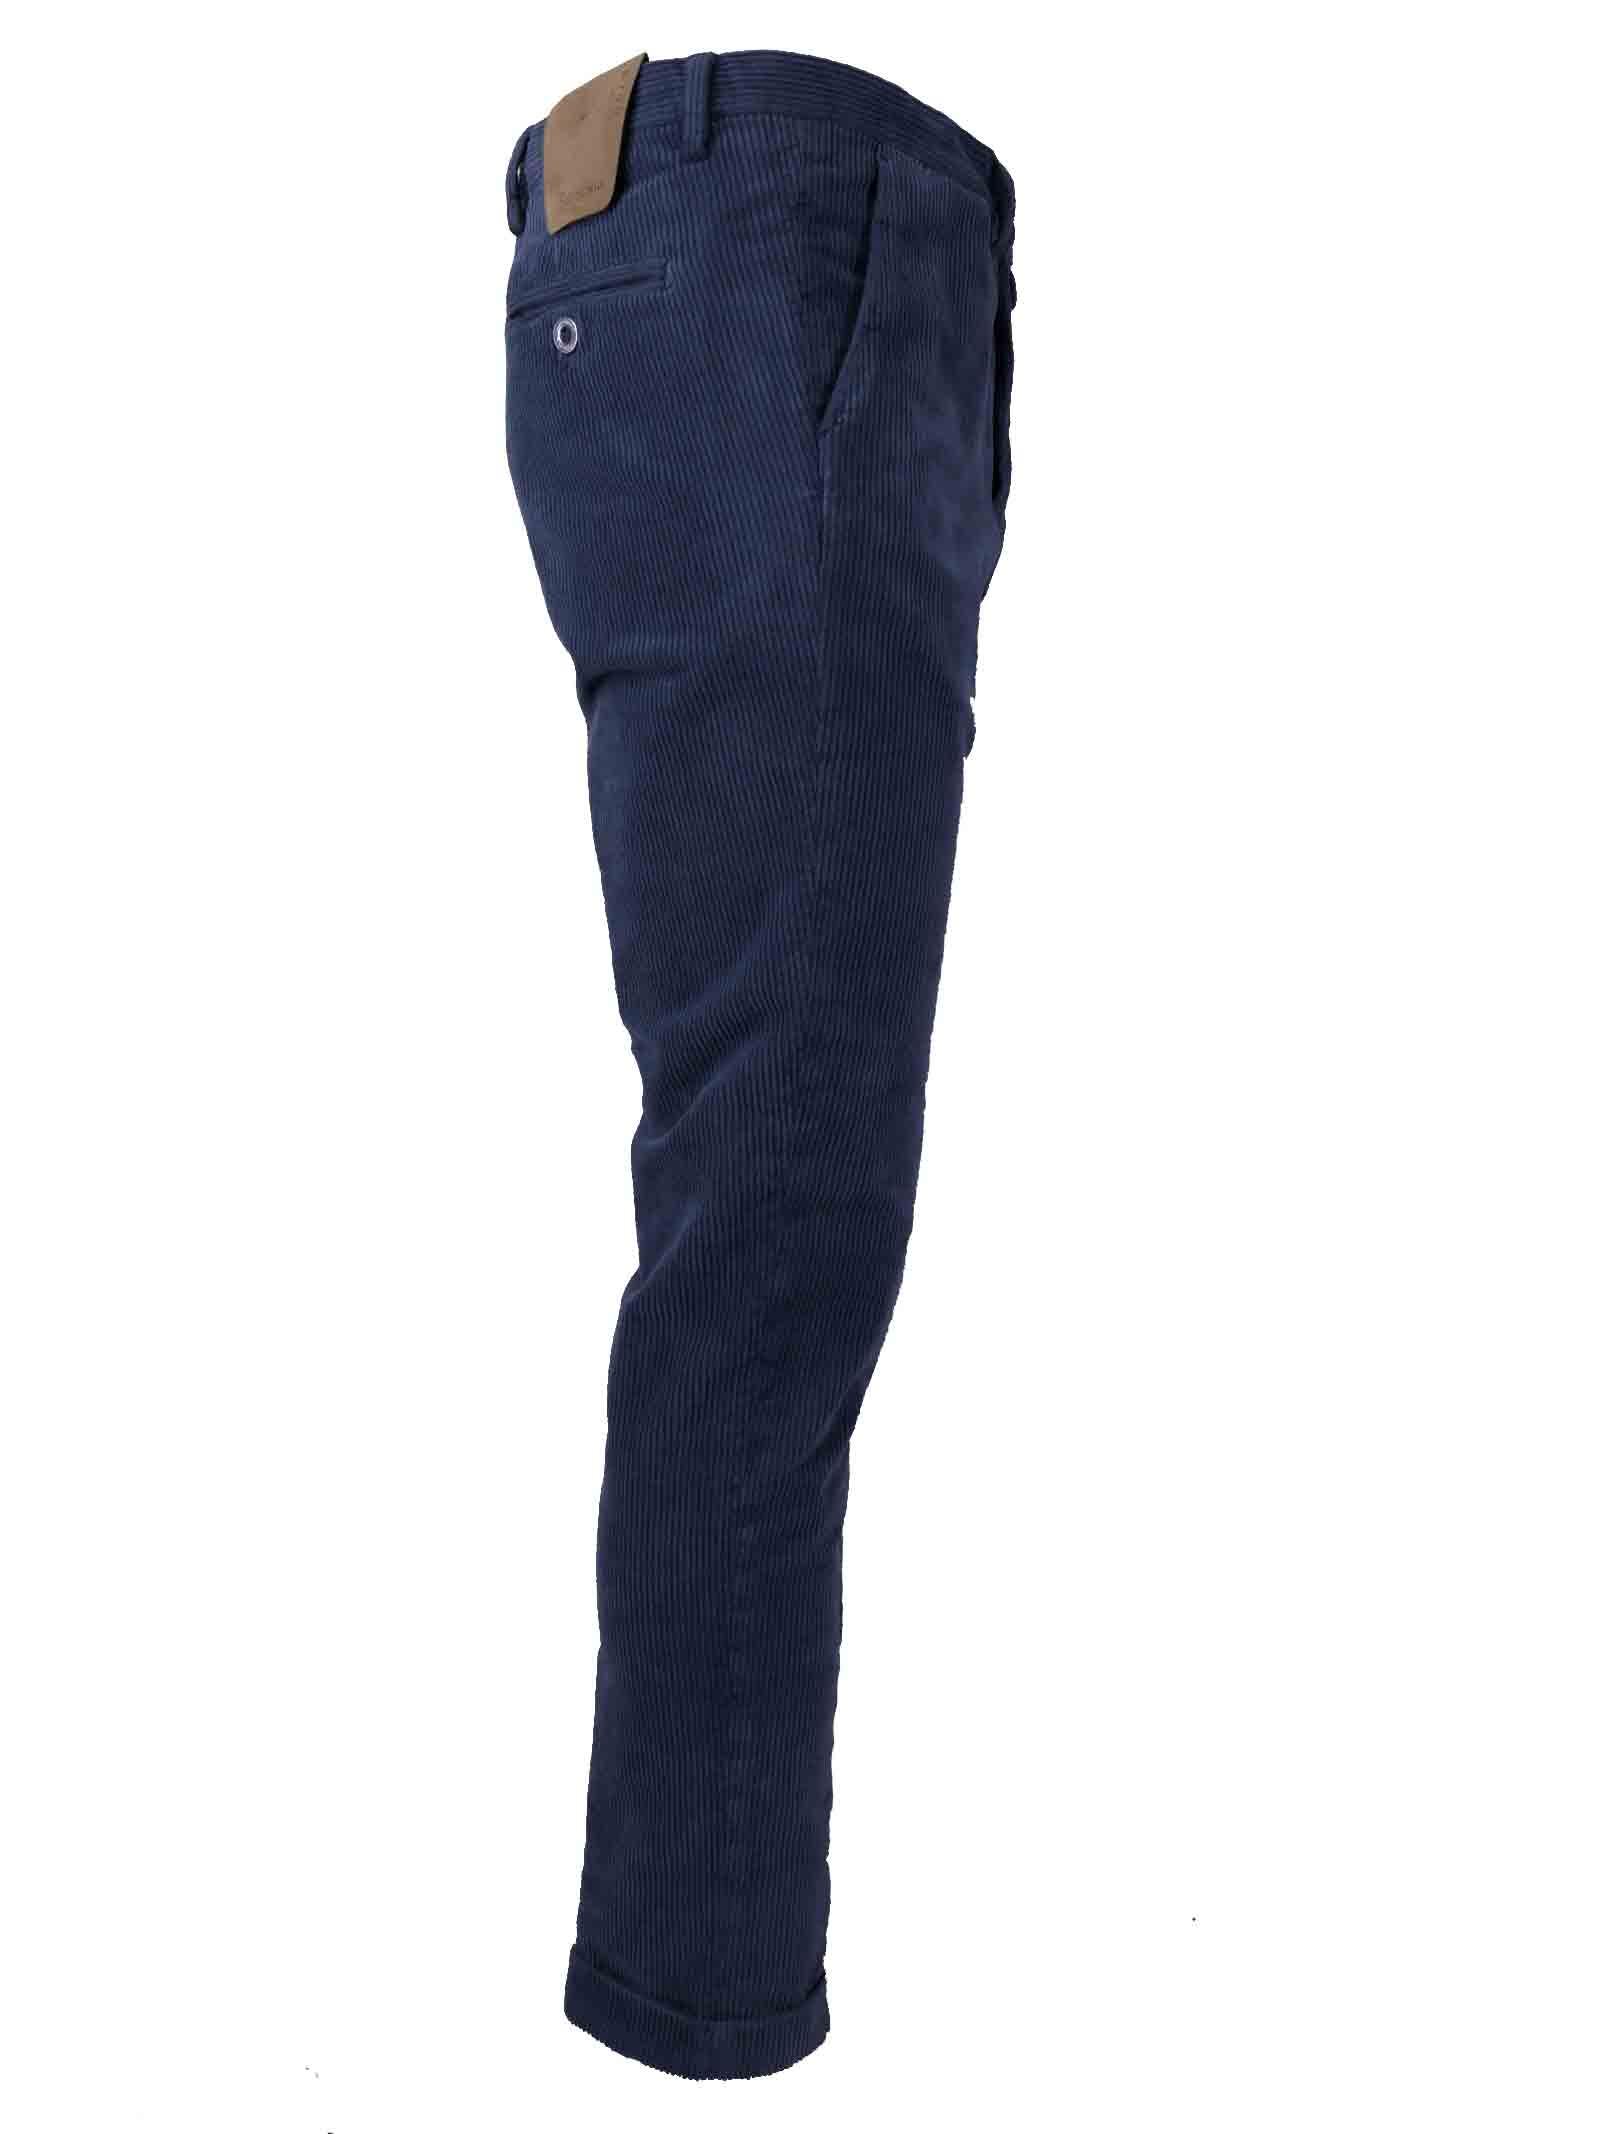 B700   Trousers   MH700 800691